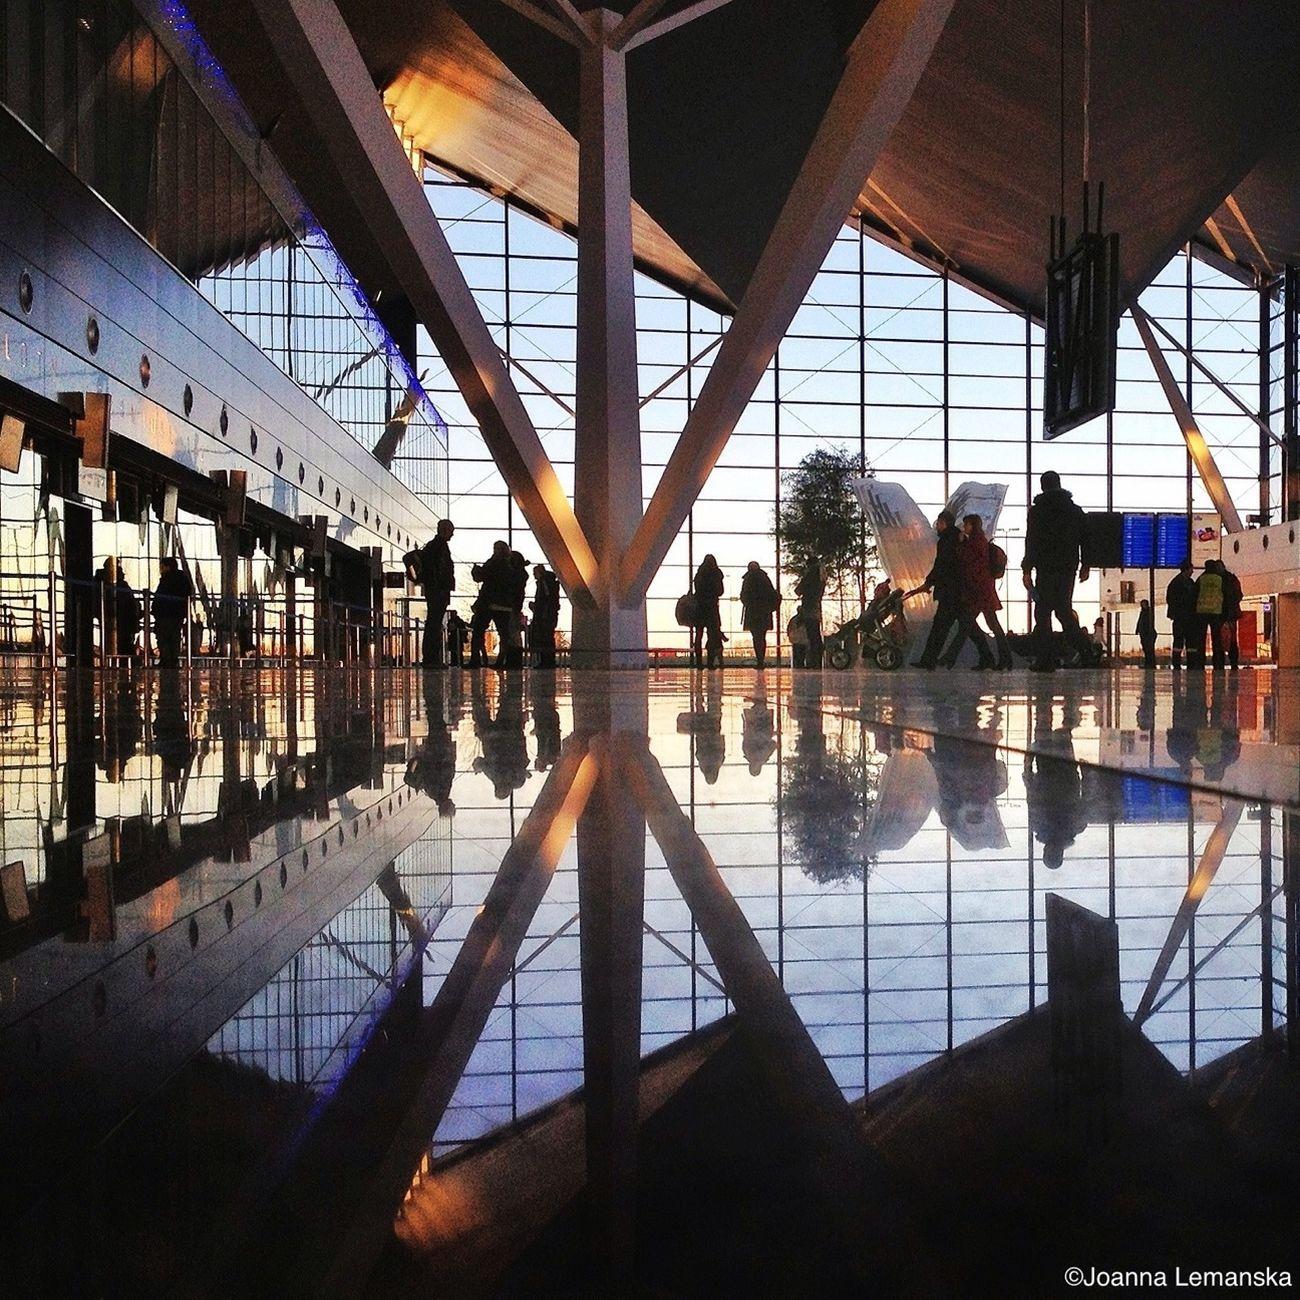 Lech Walesa Airport